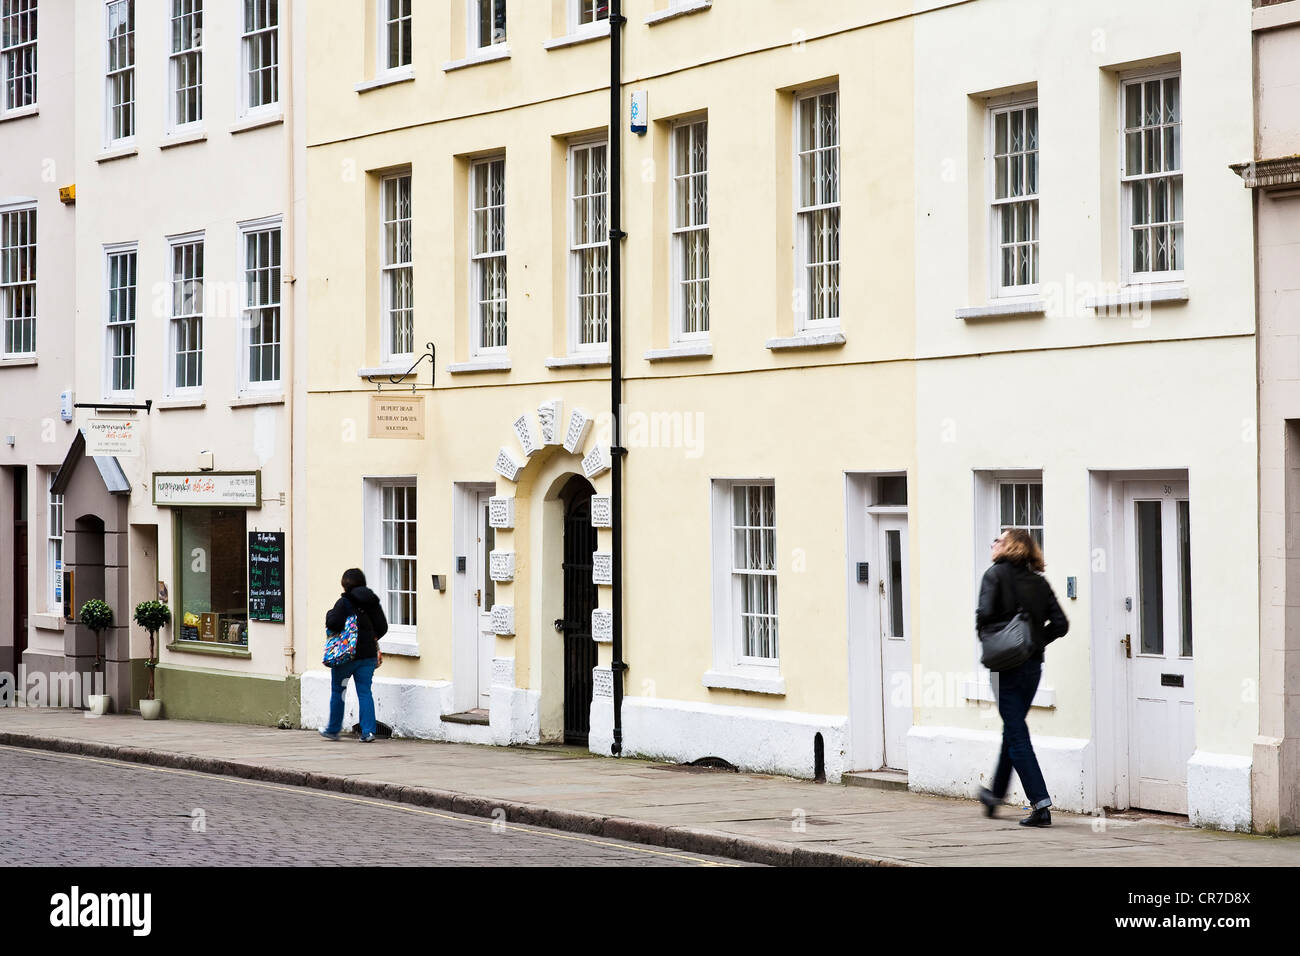 United Kingdom, East Midlands, Nottinghamshire, Nottingham, High Pavement Street, pedestrians - Stock Image